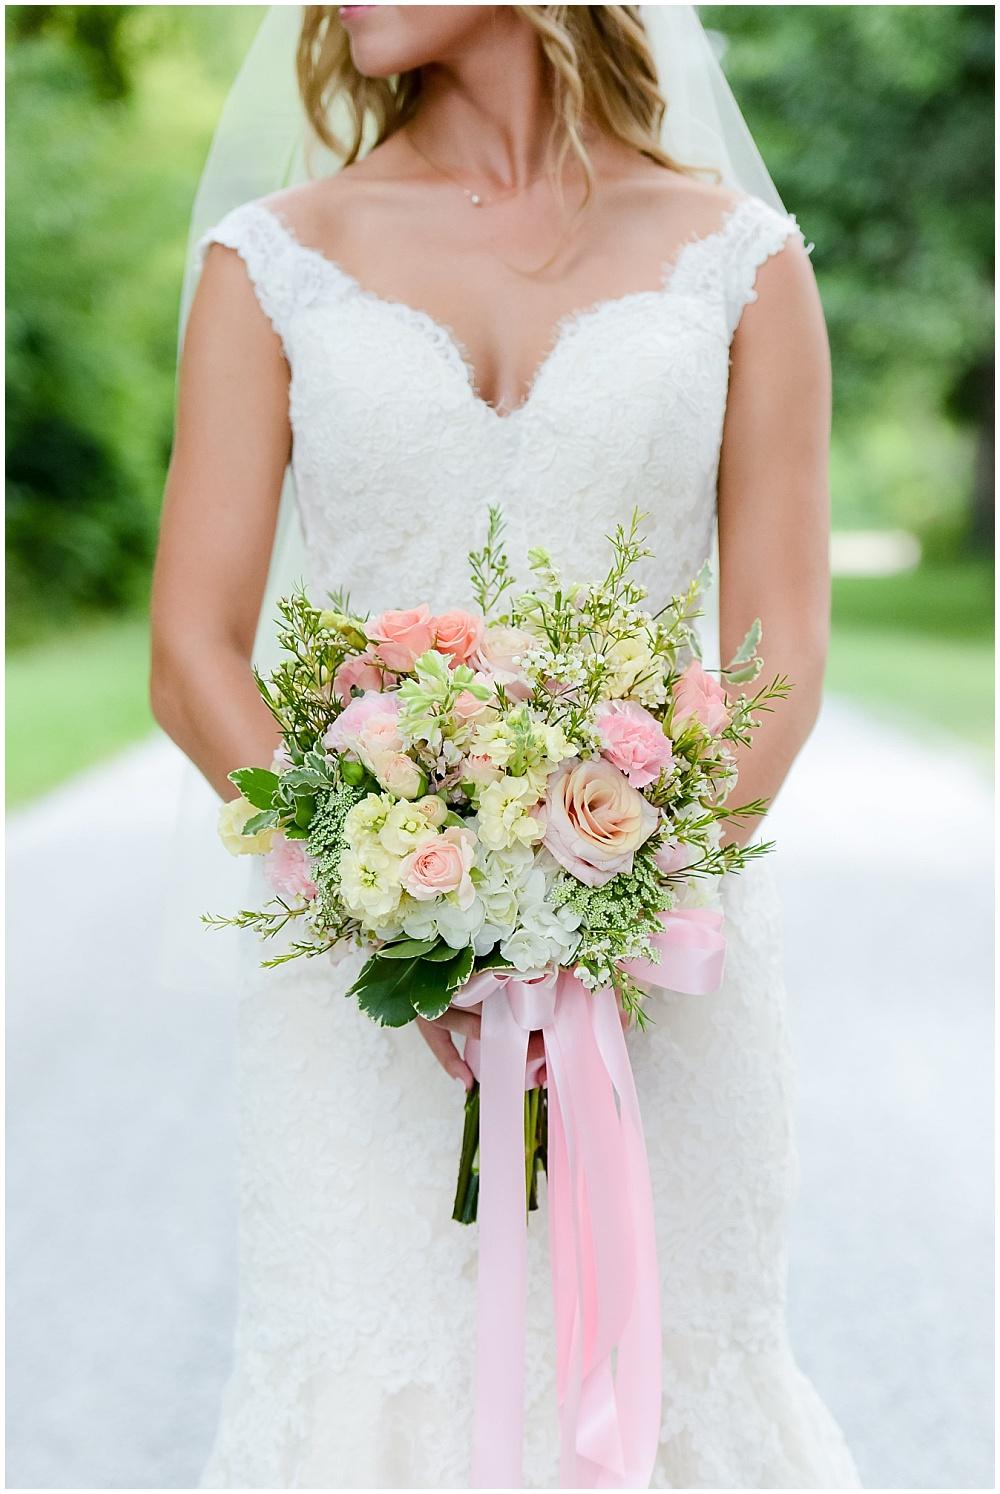 Lace wedding dress with blush, white and green bridal bouquet | Mustard Seed Gardens Wedding by Sara Ackermann Photography & Jessica Dum Wedding Coordination